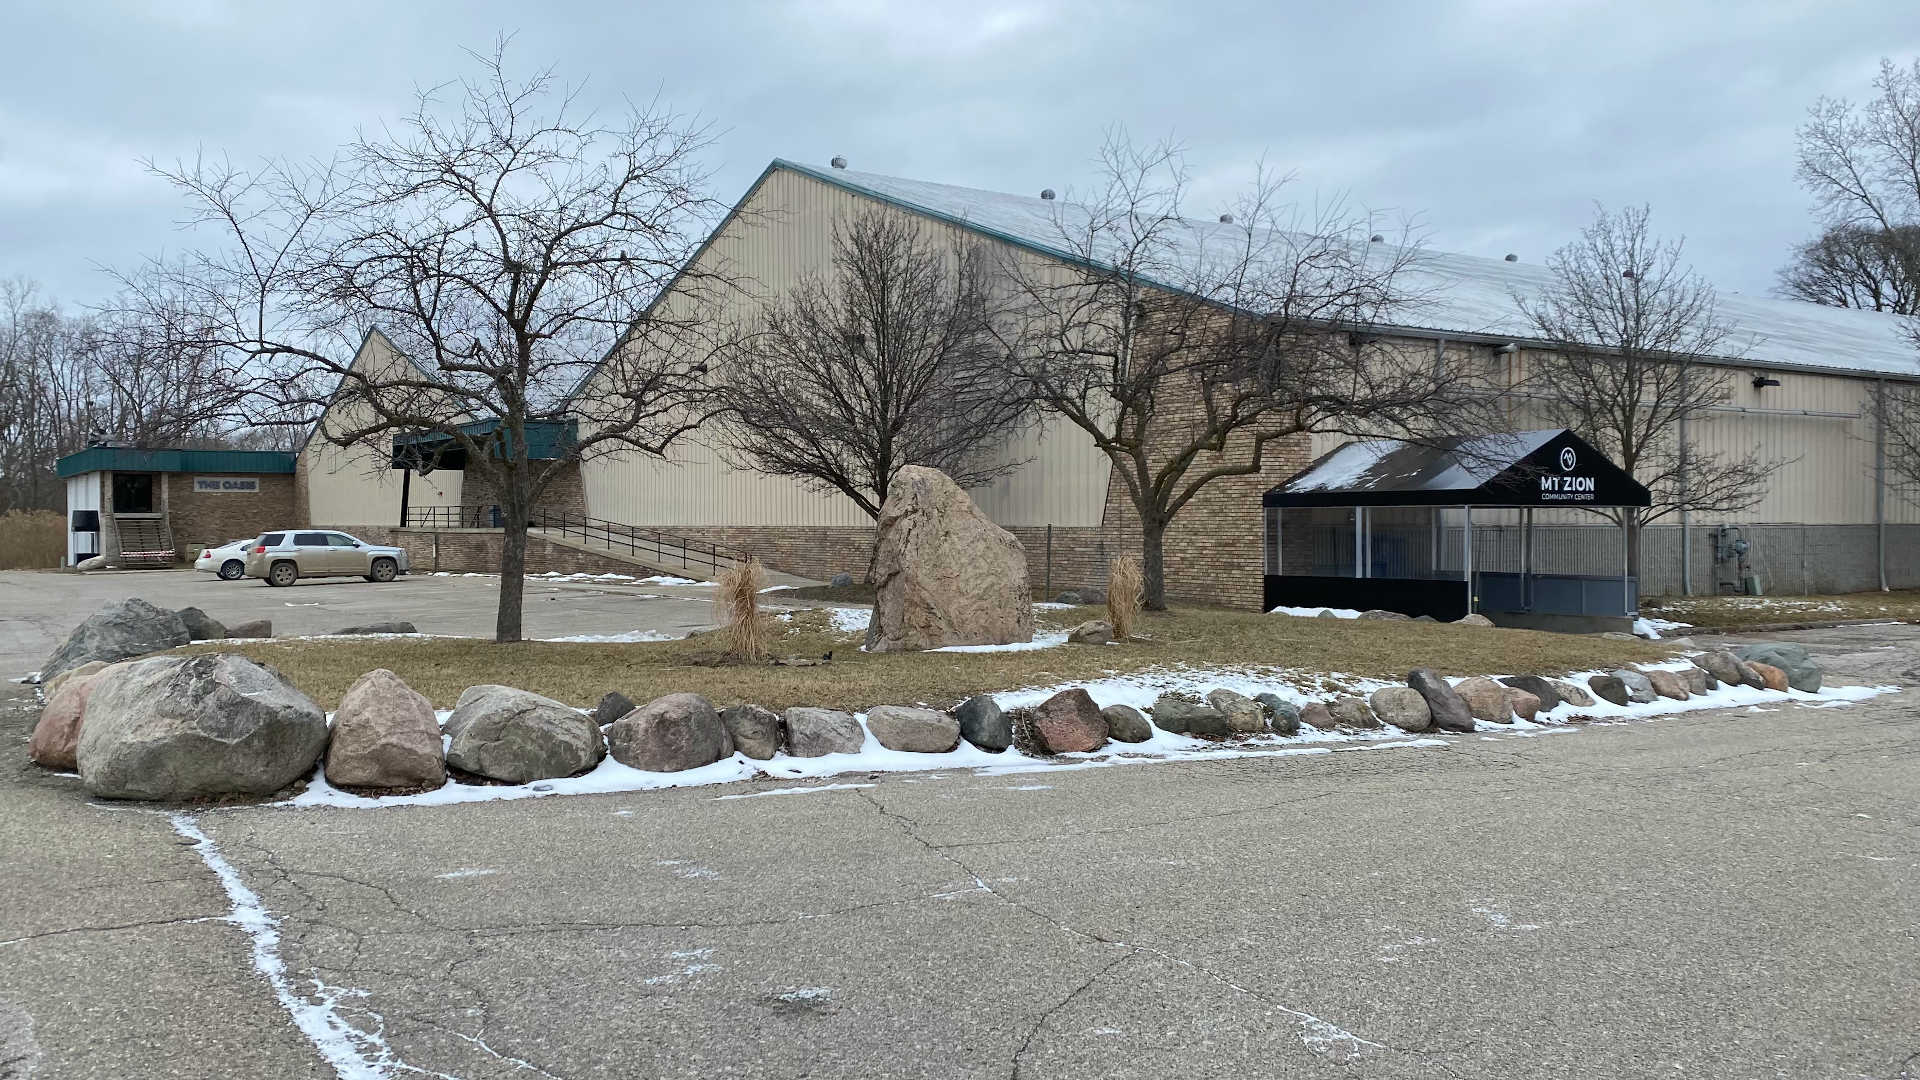 Mt Zion Community Center